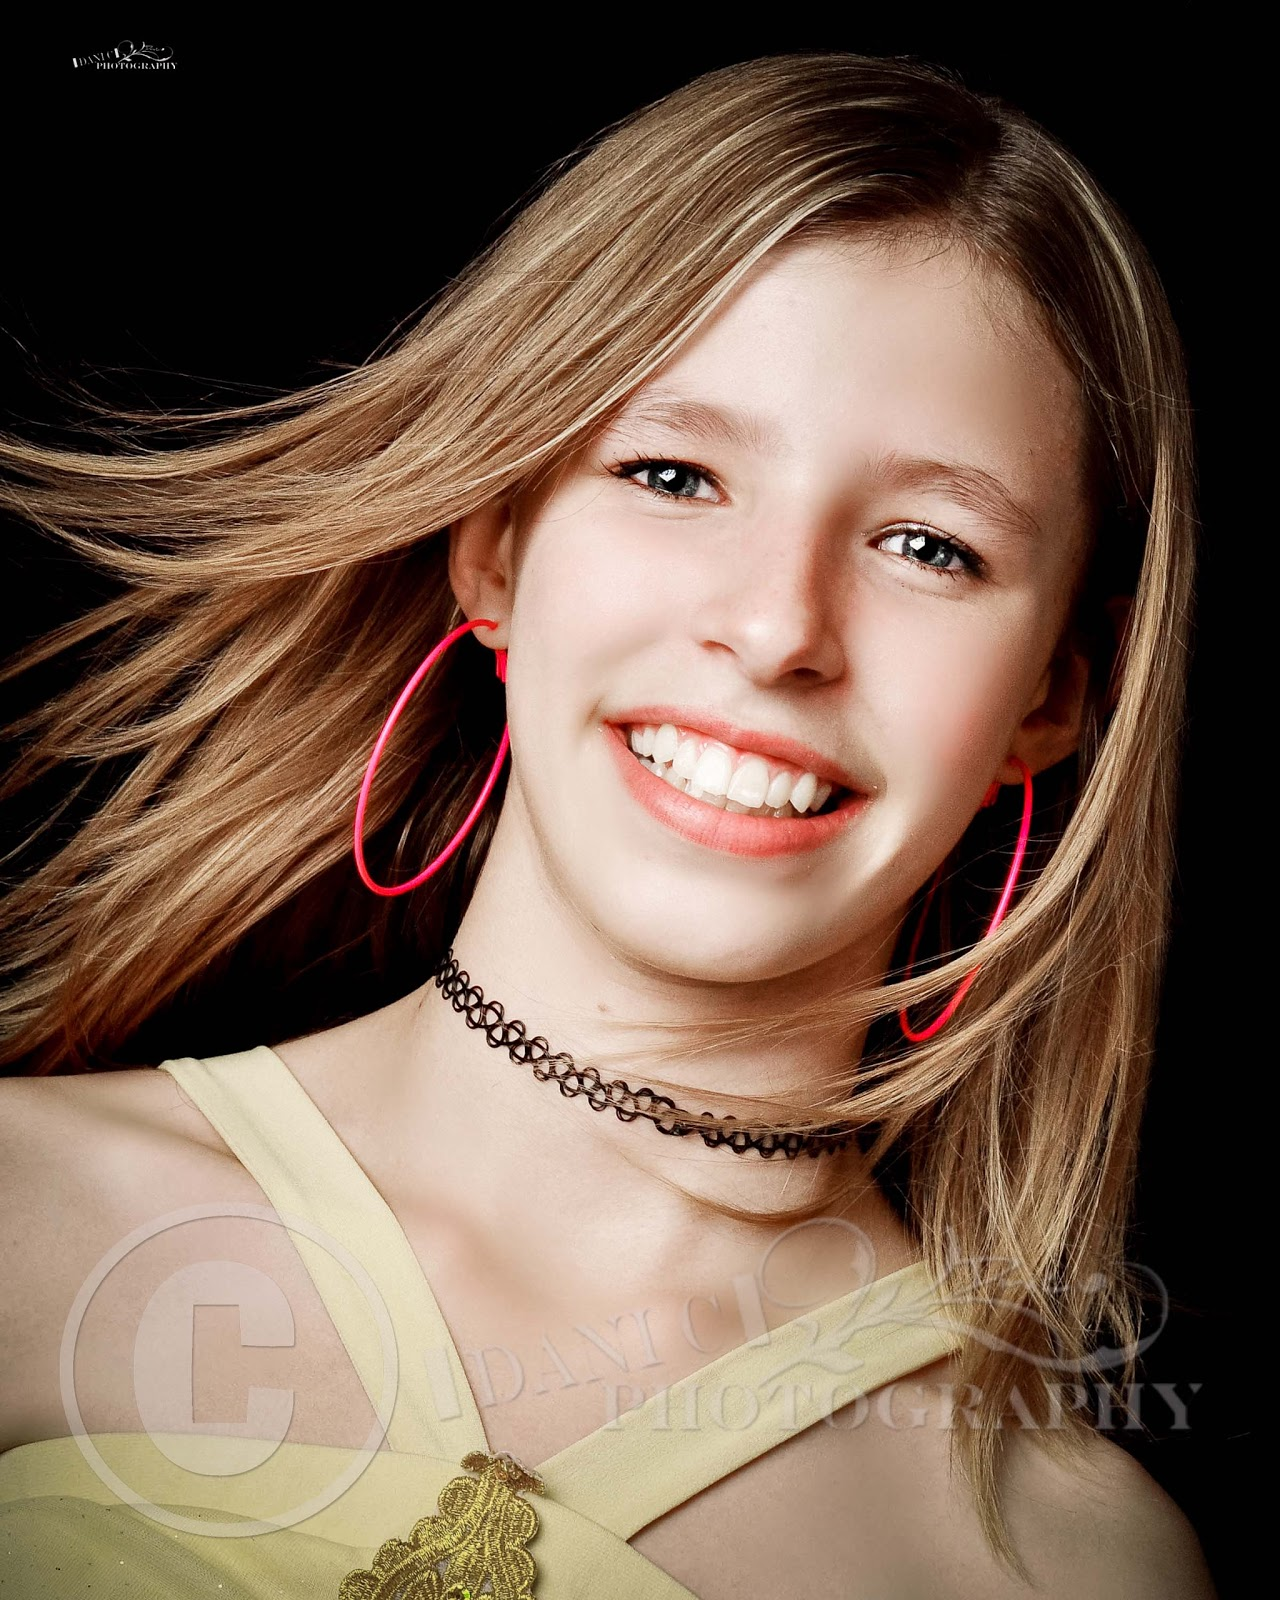 Dani C Photography The Blog: Achievment Days Girls {pre